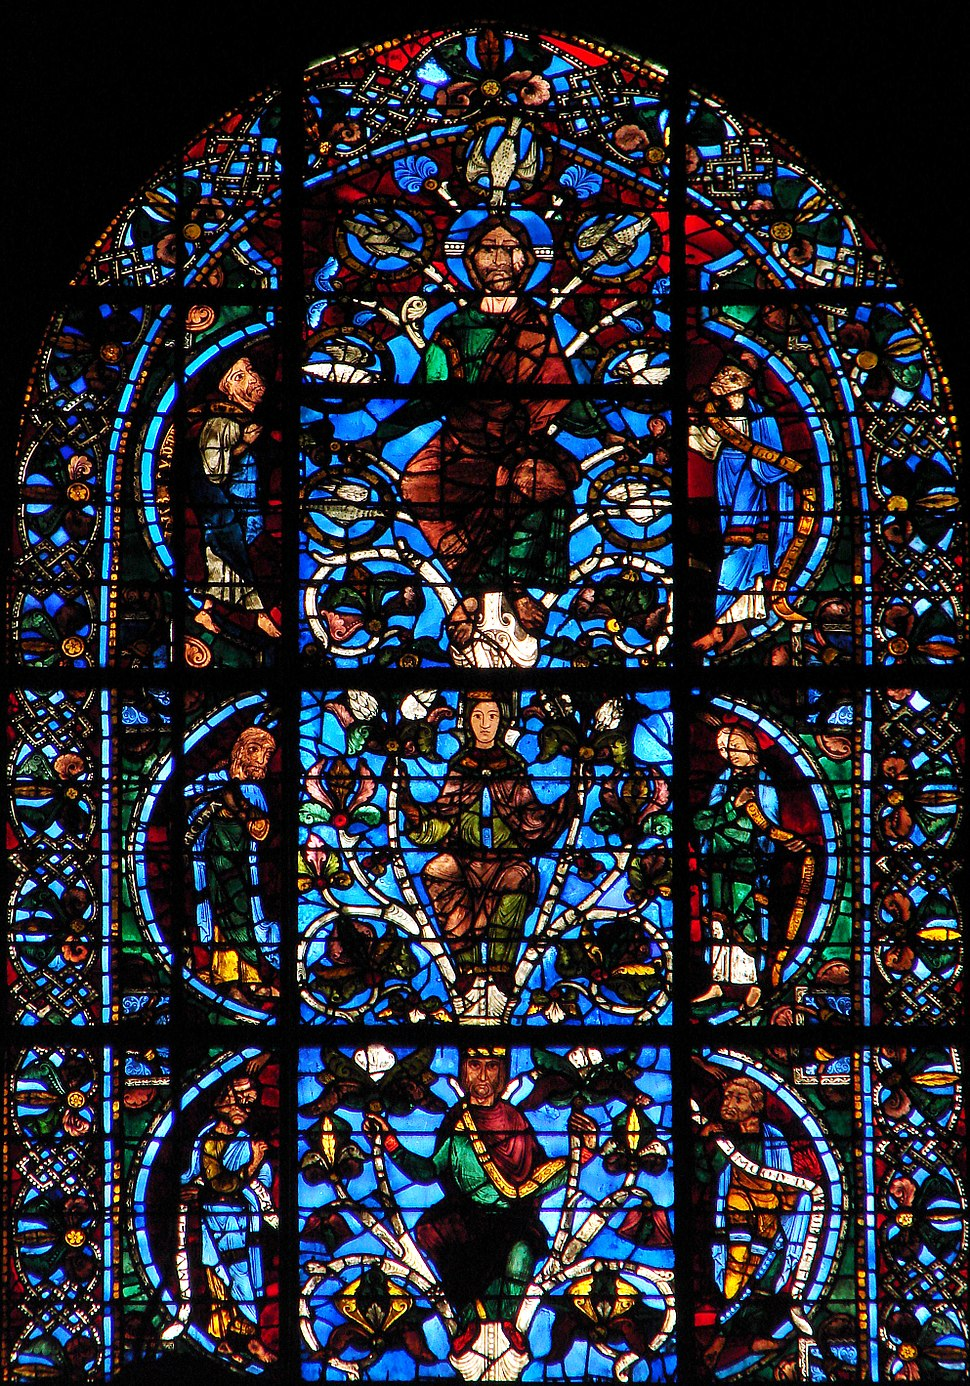 Vitrail Chartres 210209 18